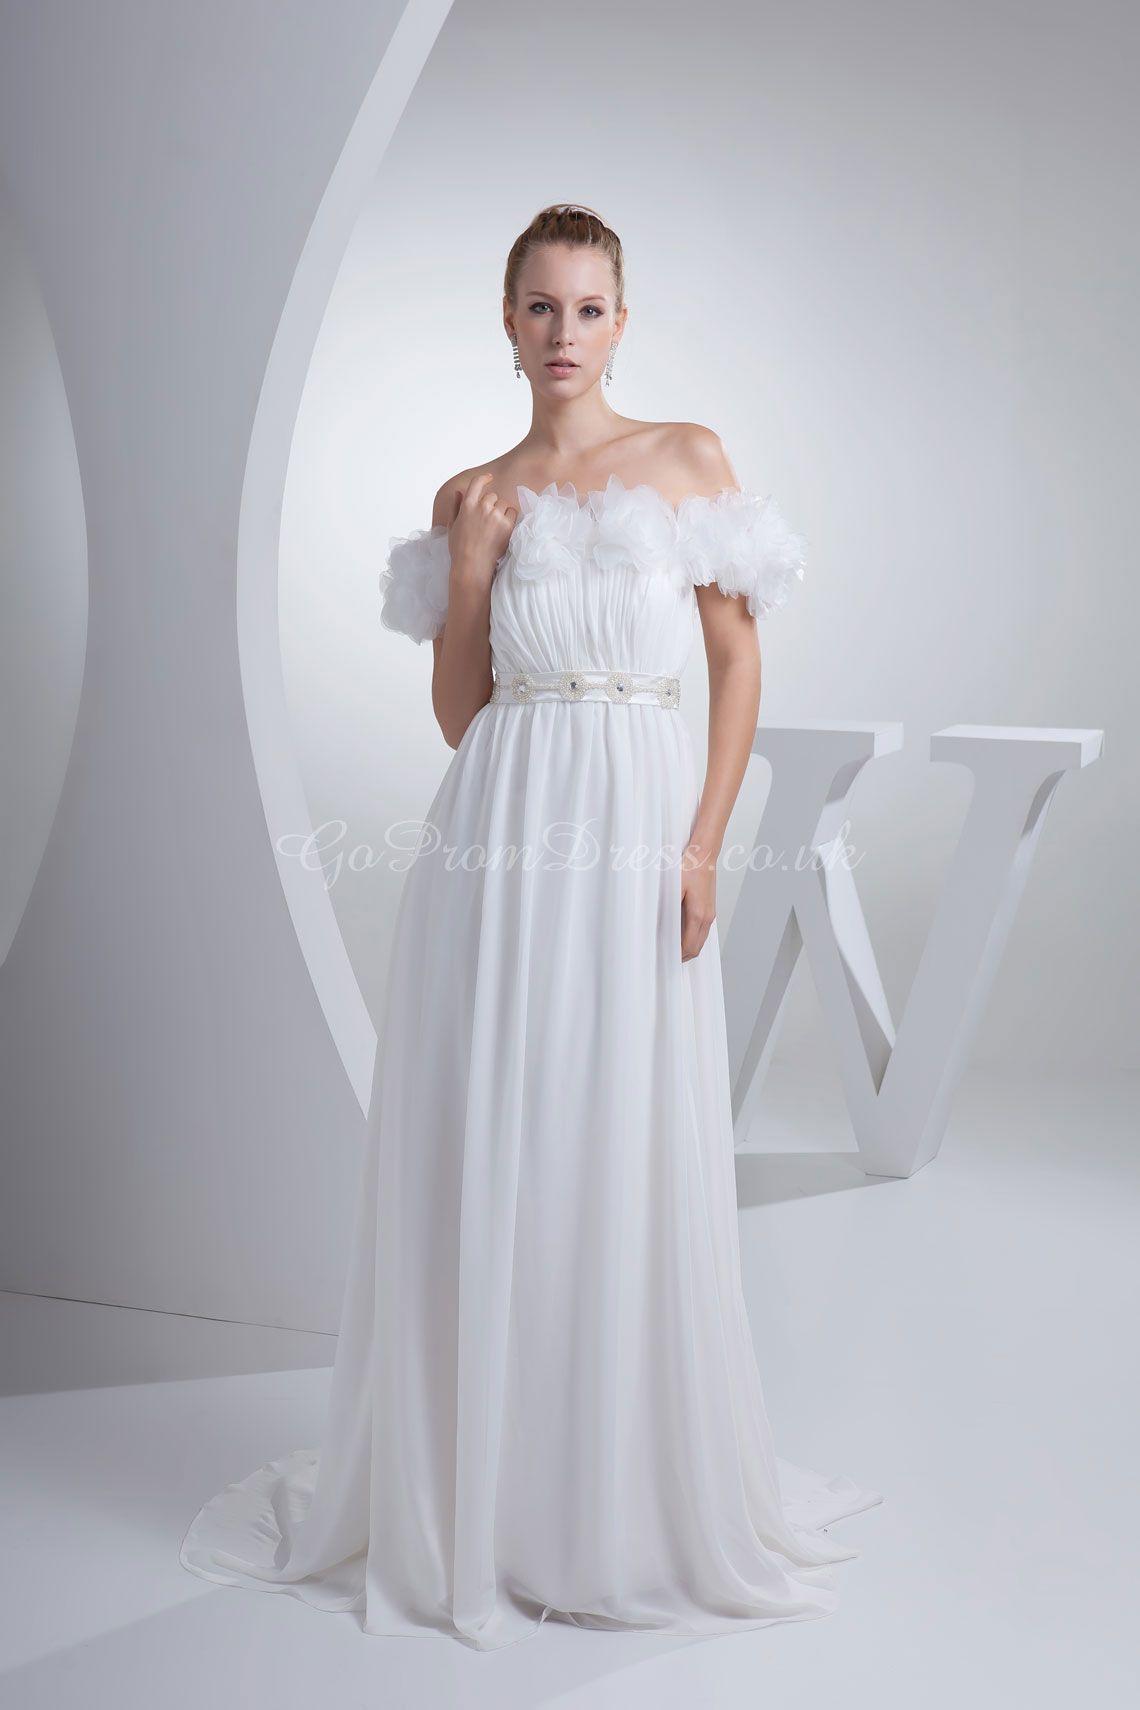 Beach wedding dress wedding dress the wonderful world of wedding